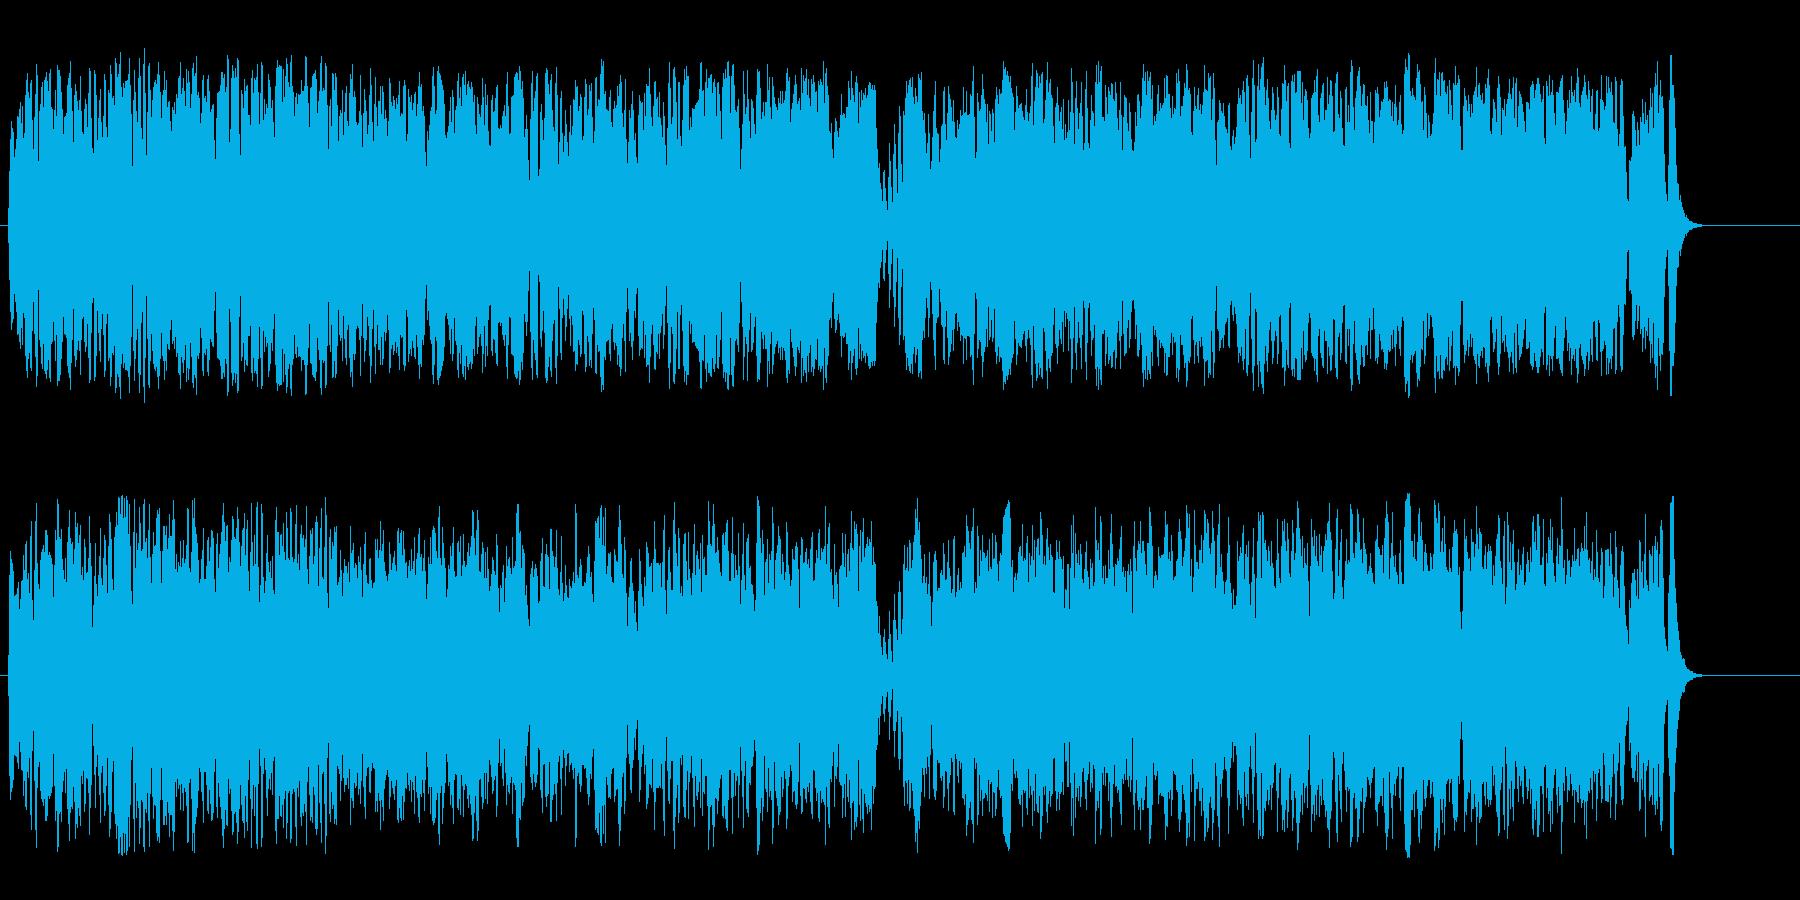 弦楽四重奏 卒業式 上品 優雅 春 散歩の再生済みの波形